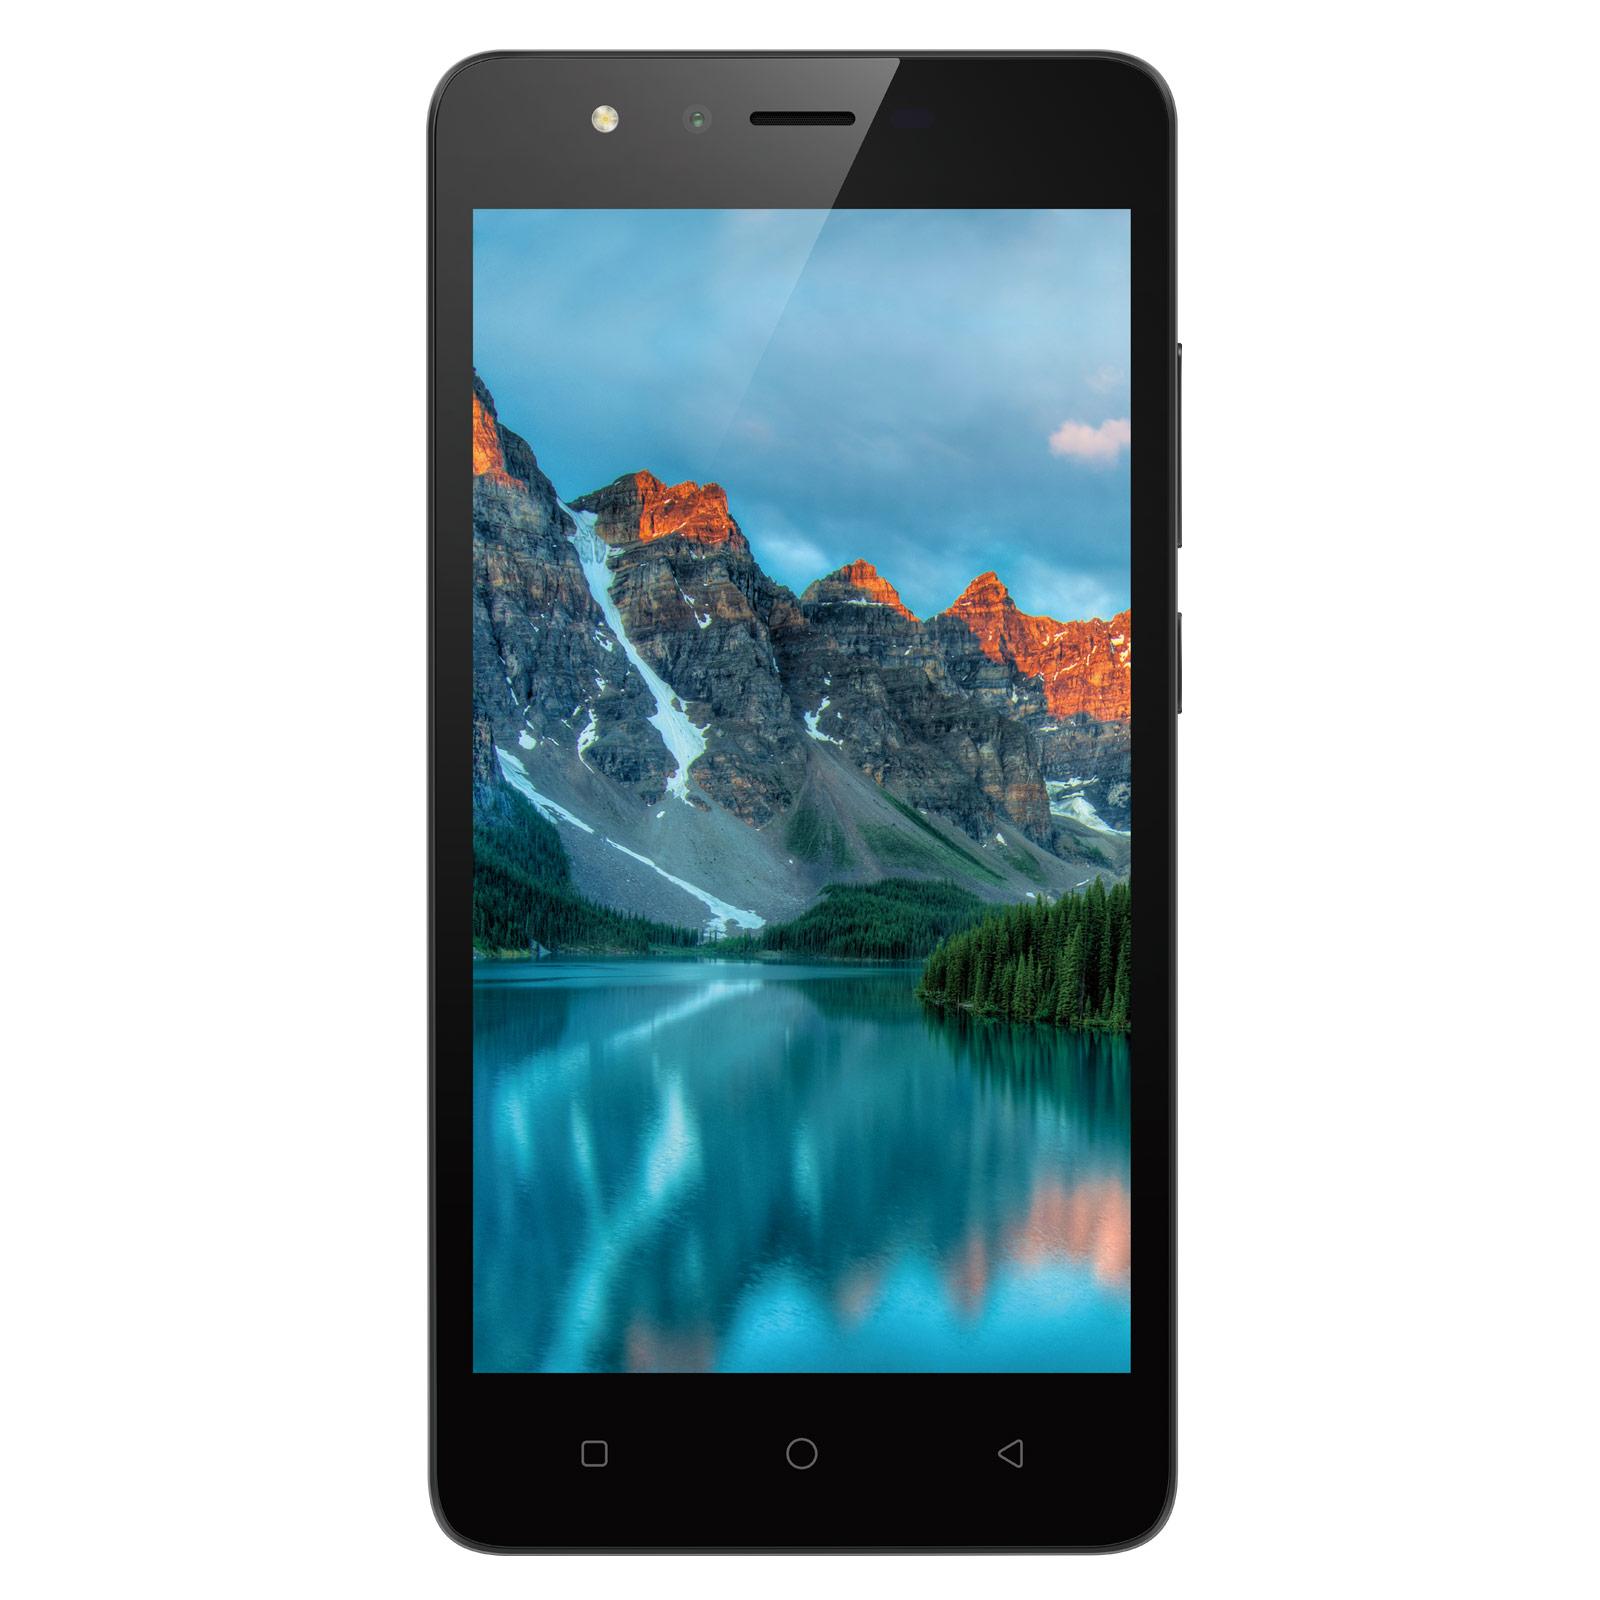 "Mobile & smartphone Neffos C5A Gris Smartphone 3G Dual SIM - MediaTek MT6580M Quad-Core 1.3 GHz - RAM 1 Go - Ecran tactile 5"" 480 x 854 - 8 Go - Bluetooth 4.0 - 2300 mAh - Android 7.0"